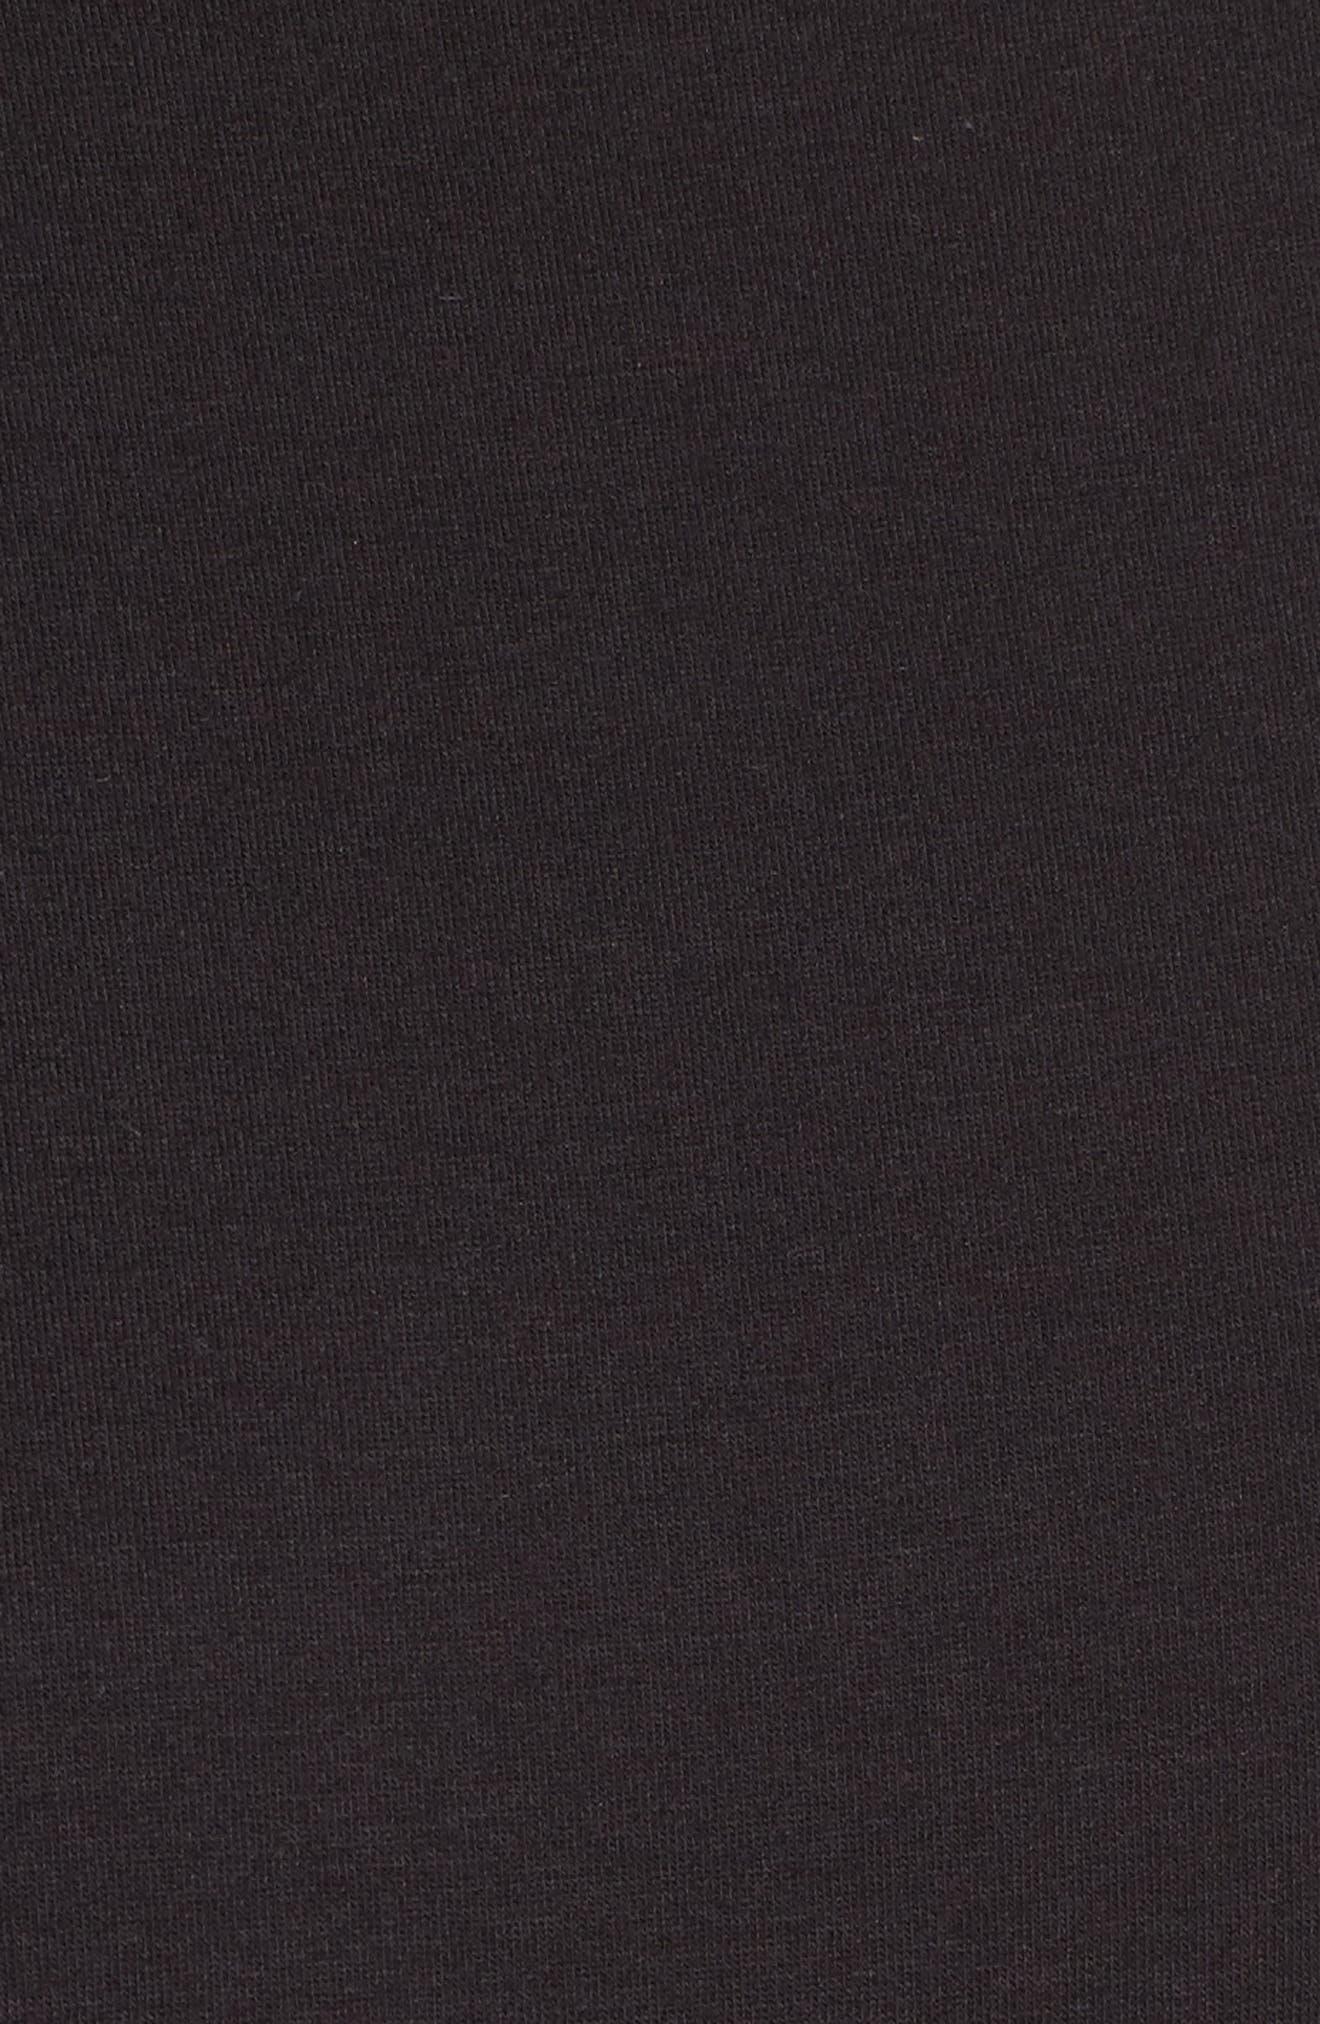 Colombe Knit Sheath Dress,                             Alternate thumbnail 5, color,                             001